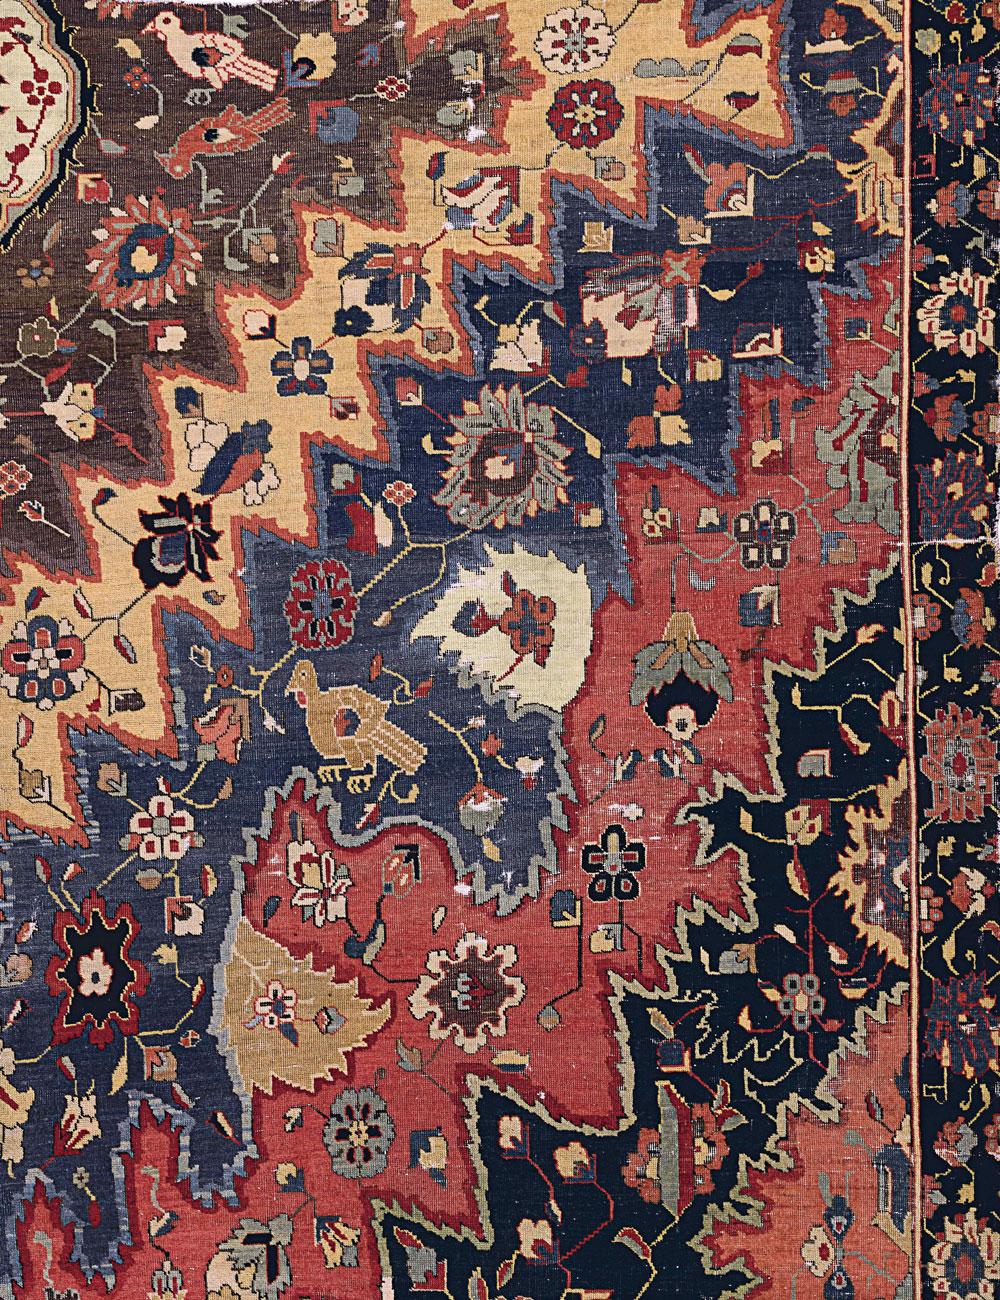 'Portuguese' carpet fragment